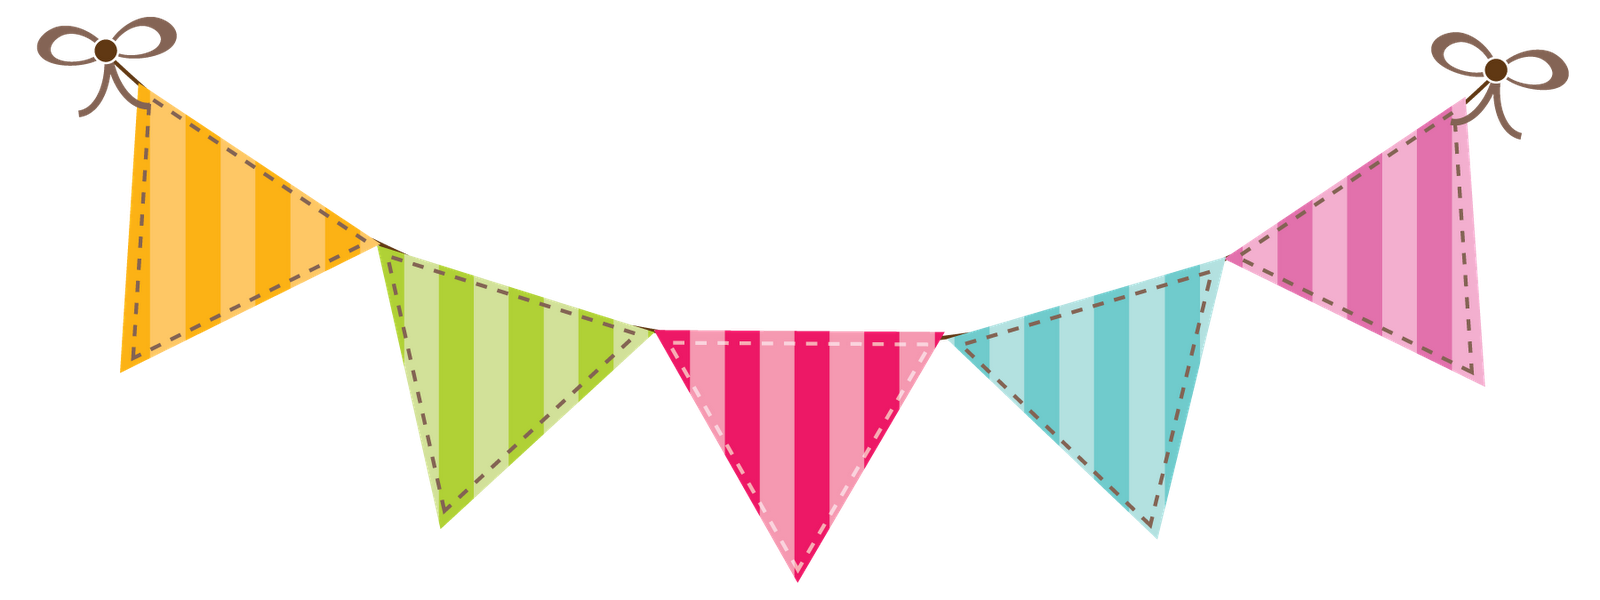 Banner flag clipart clip art library stock Pennant Flag Clipart | Free download best Pennant Flag Clipart on ... clip art library stock